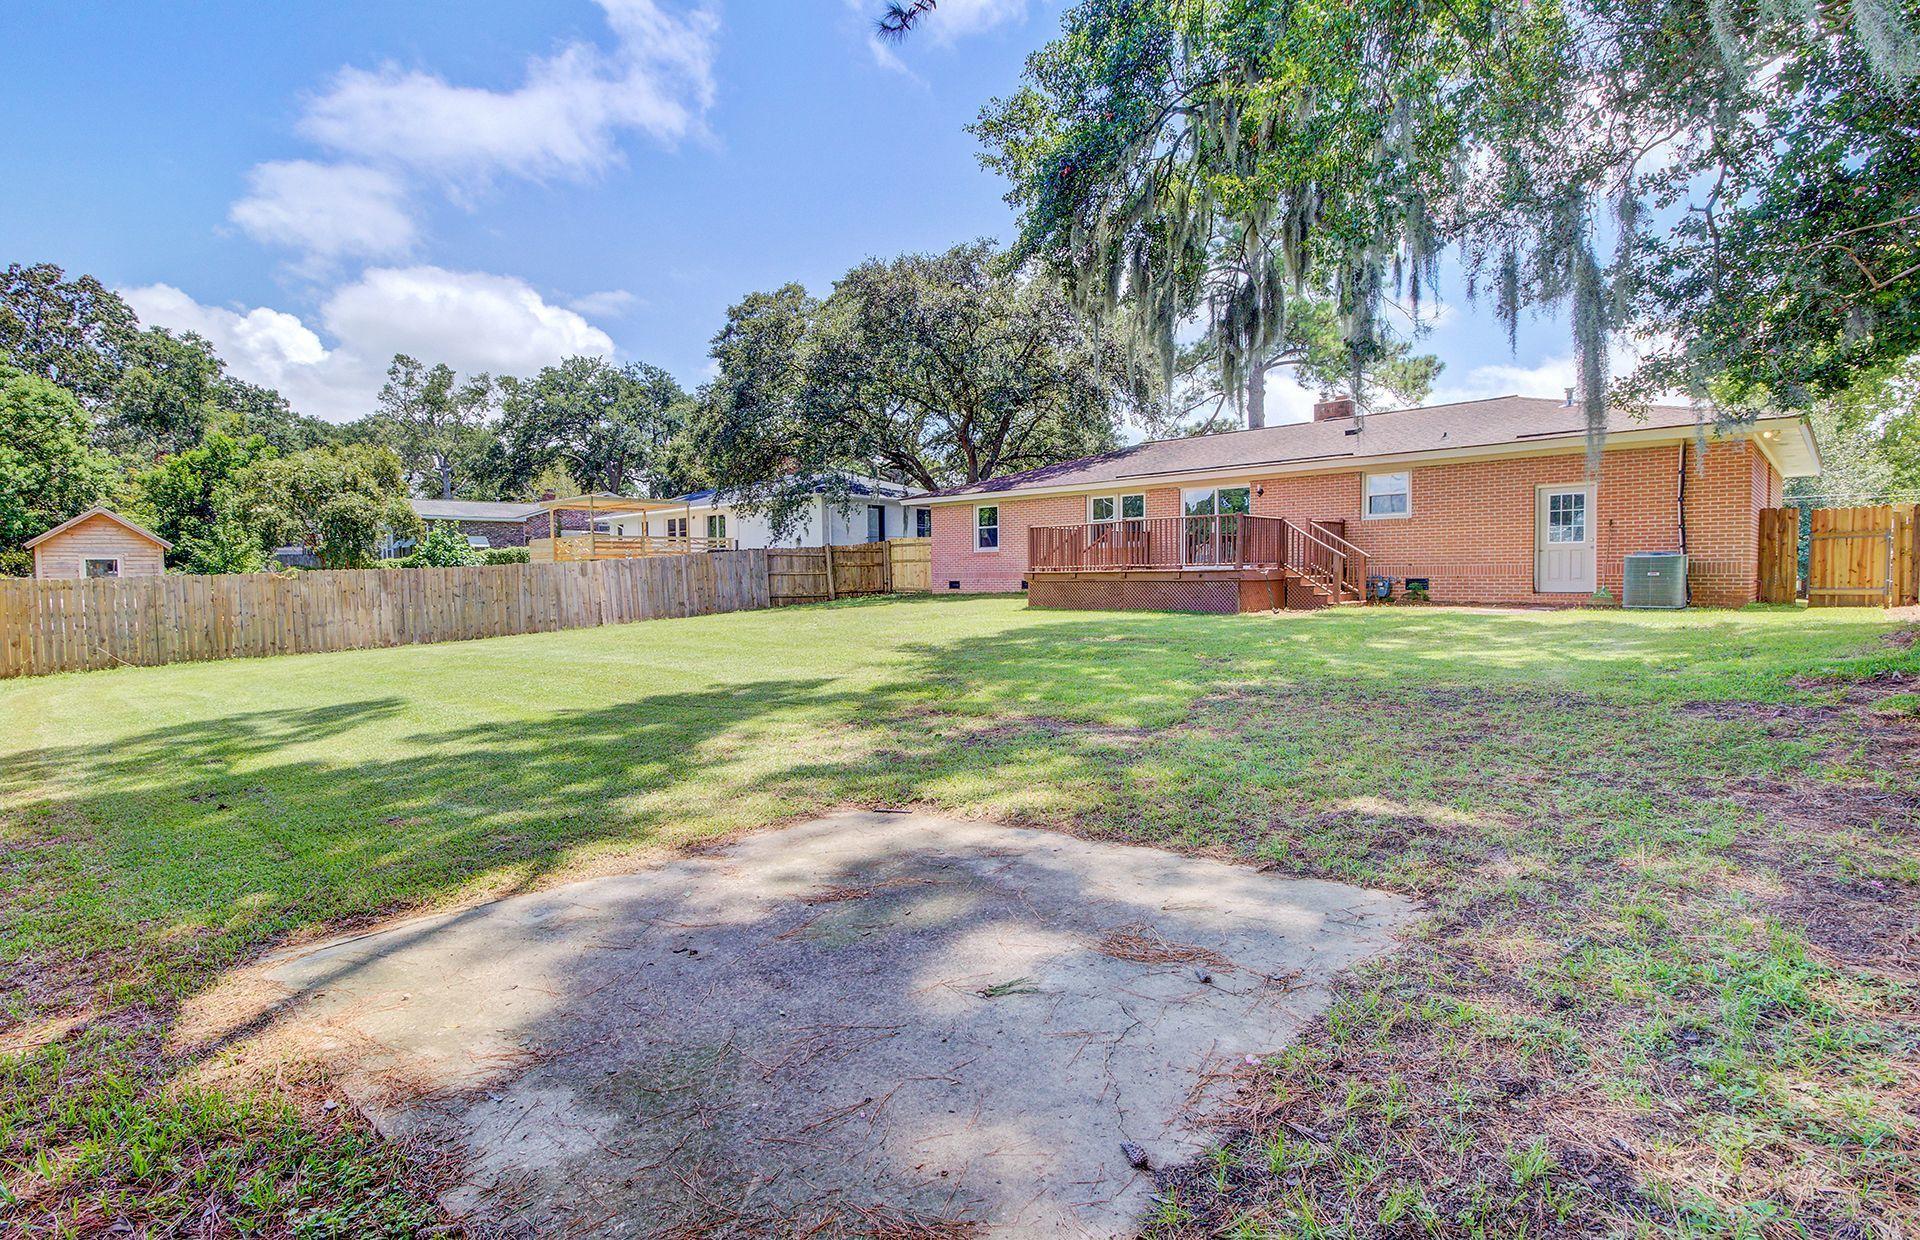 Belvedere Estates Homes For Sale - 6010 Ridgecrest, Hanahan, SC - 31